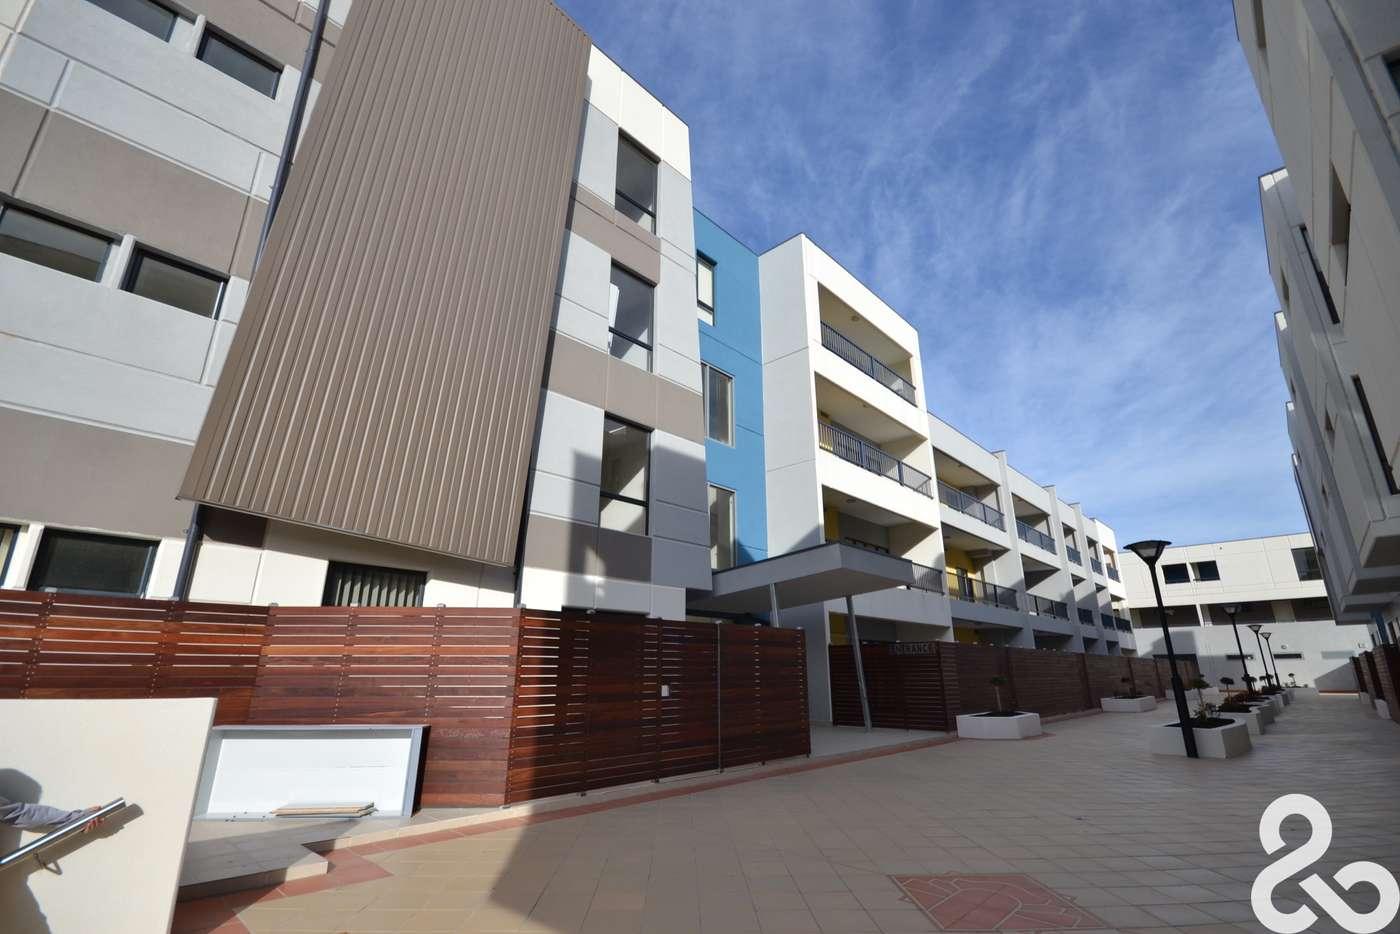 Main view of Homely apartment listing, 307A/41-43 Stockade Avenue, Coburg VIC 3058